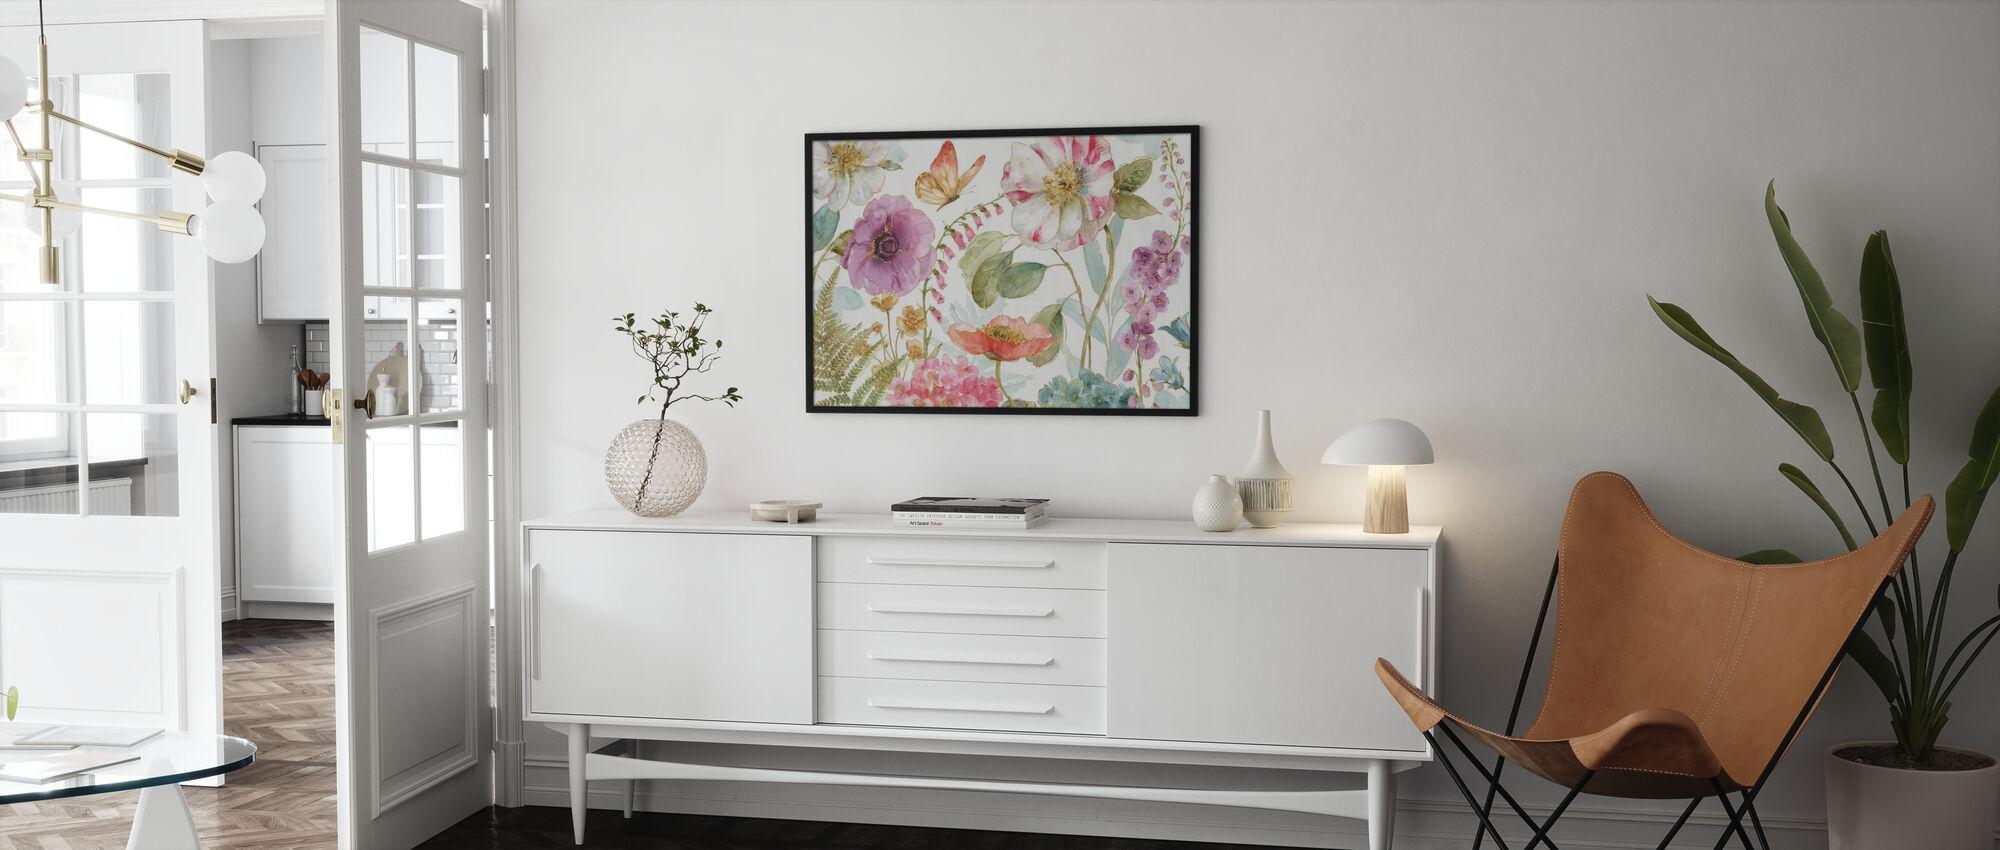 Regnbåge Frön Blommor 1 - Inramad tavla - Vardagsrum